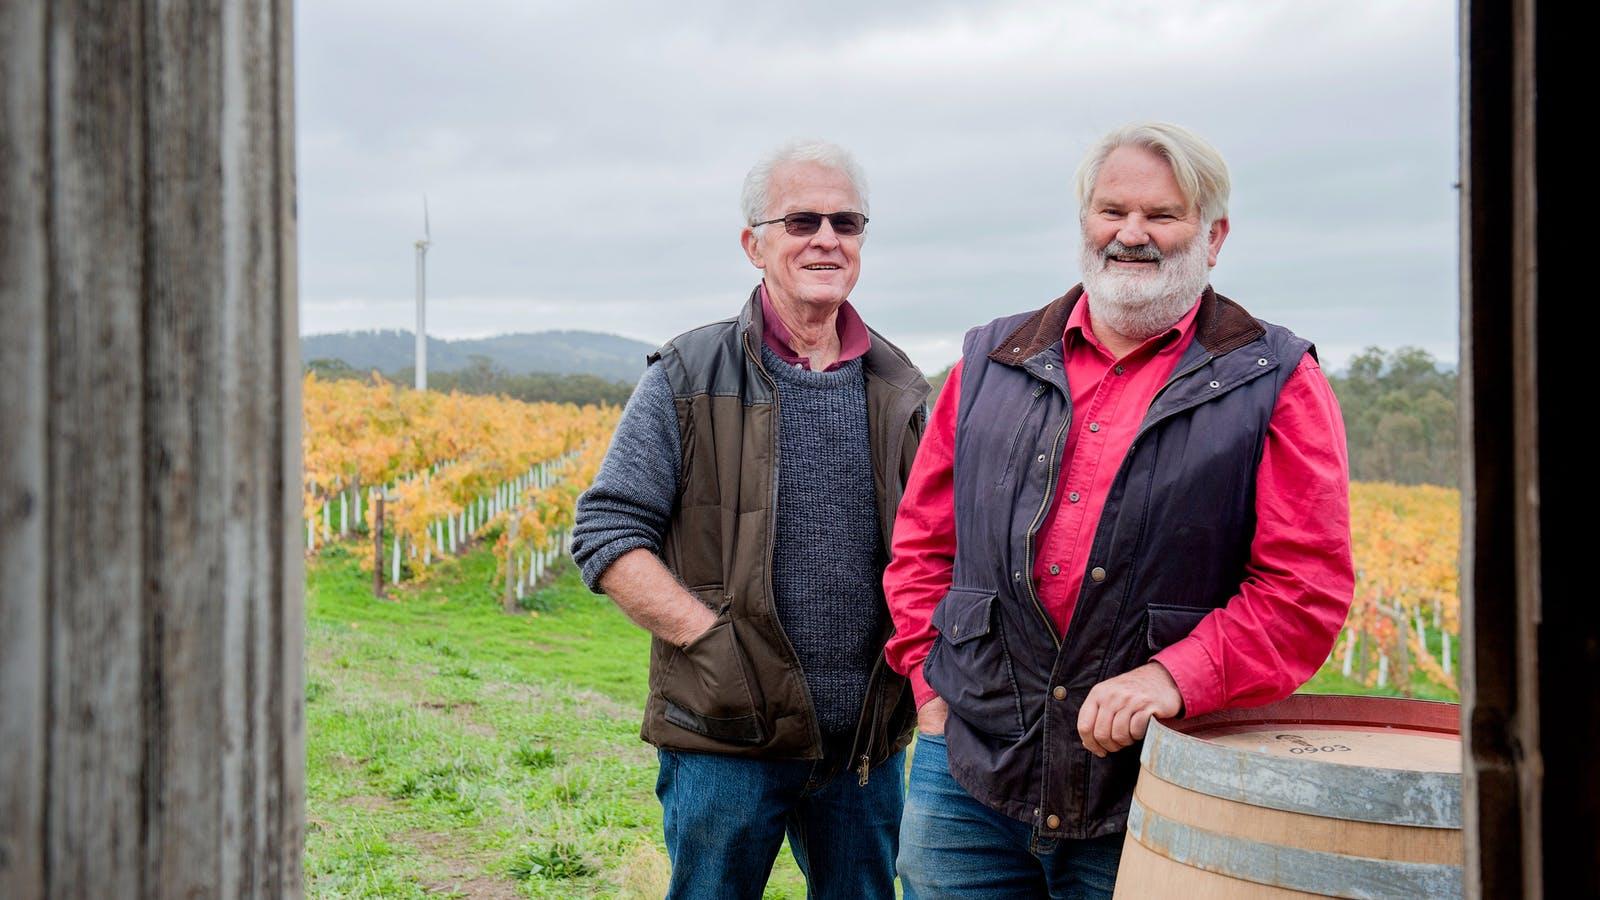 Ian McKenzie and Ken Pollock at Blackjack Vineyards